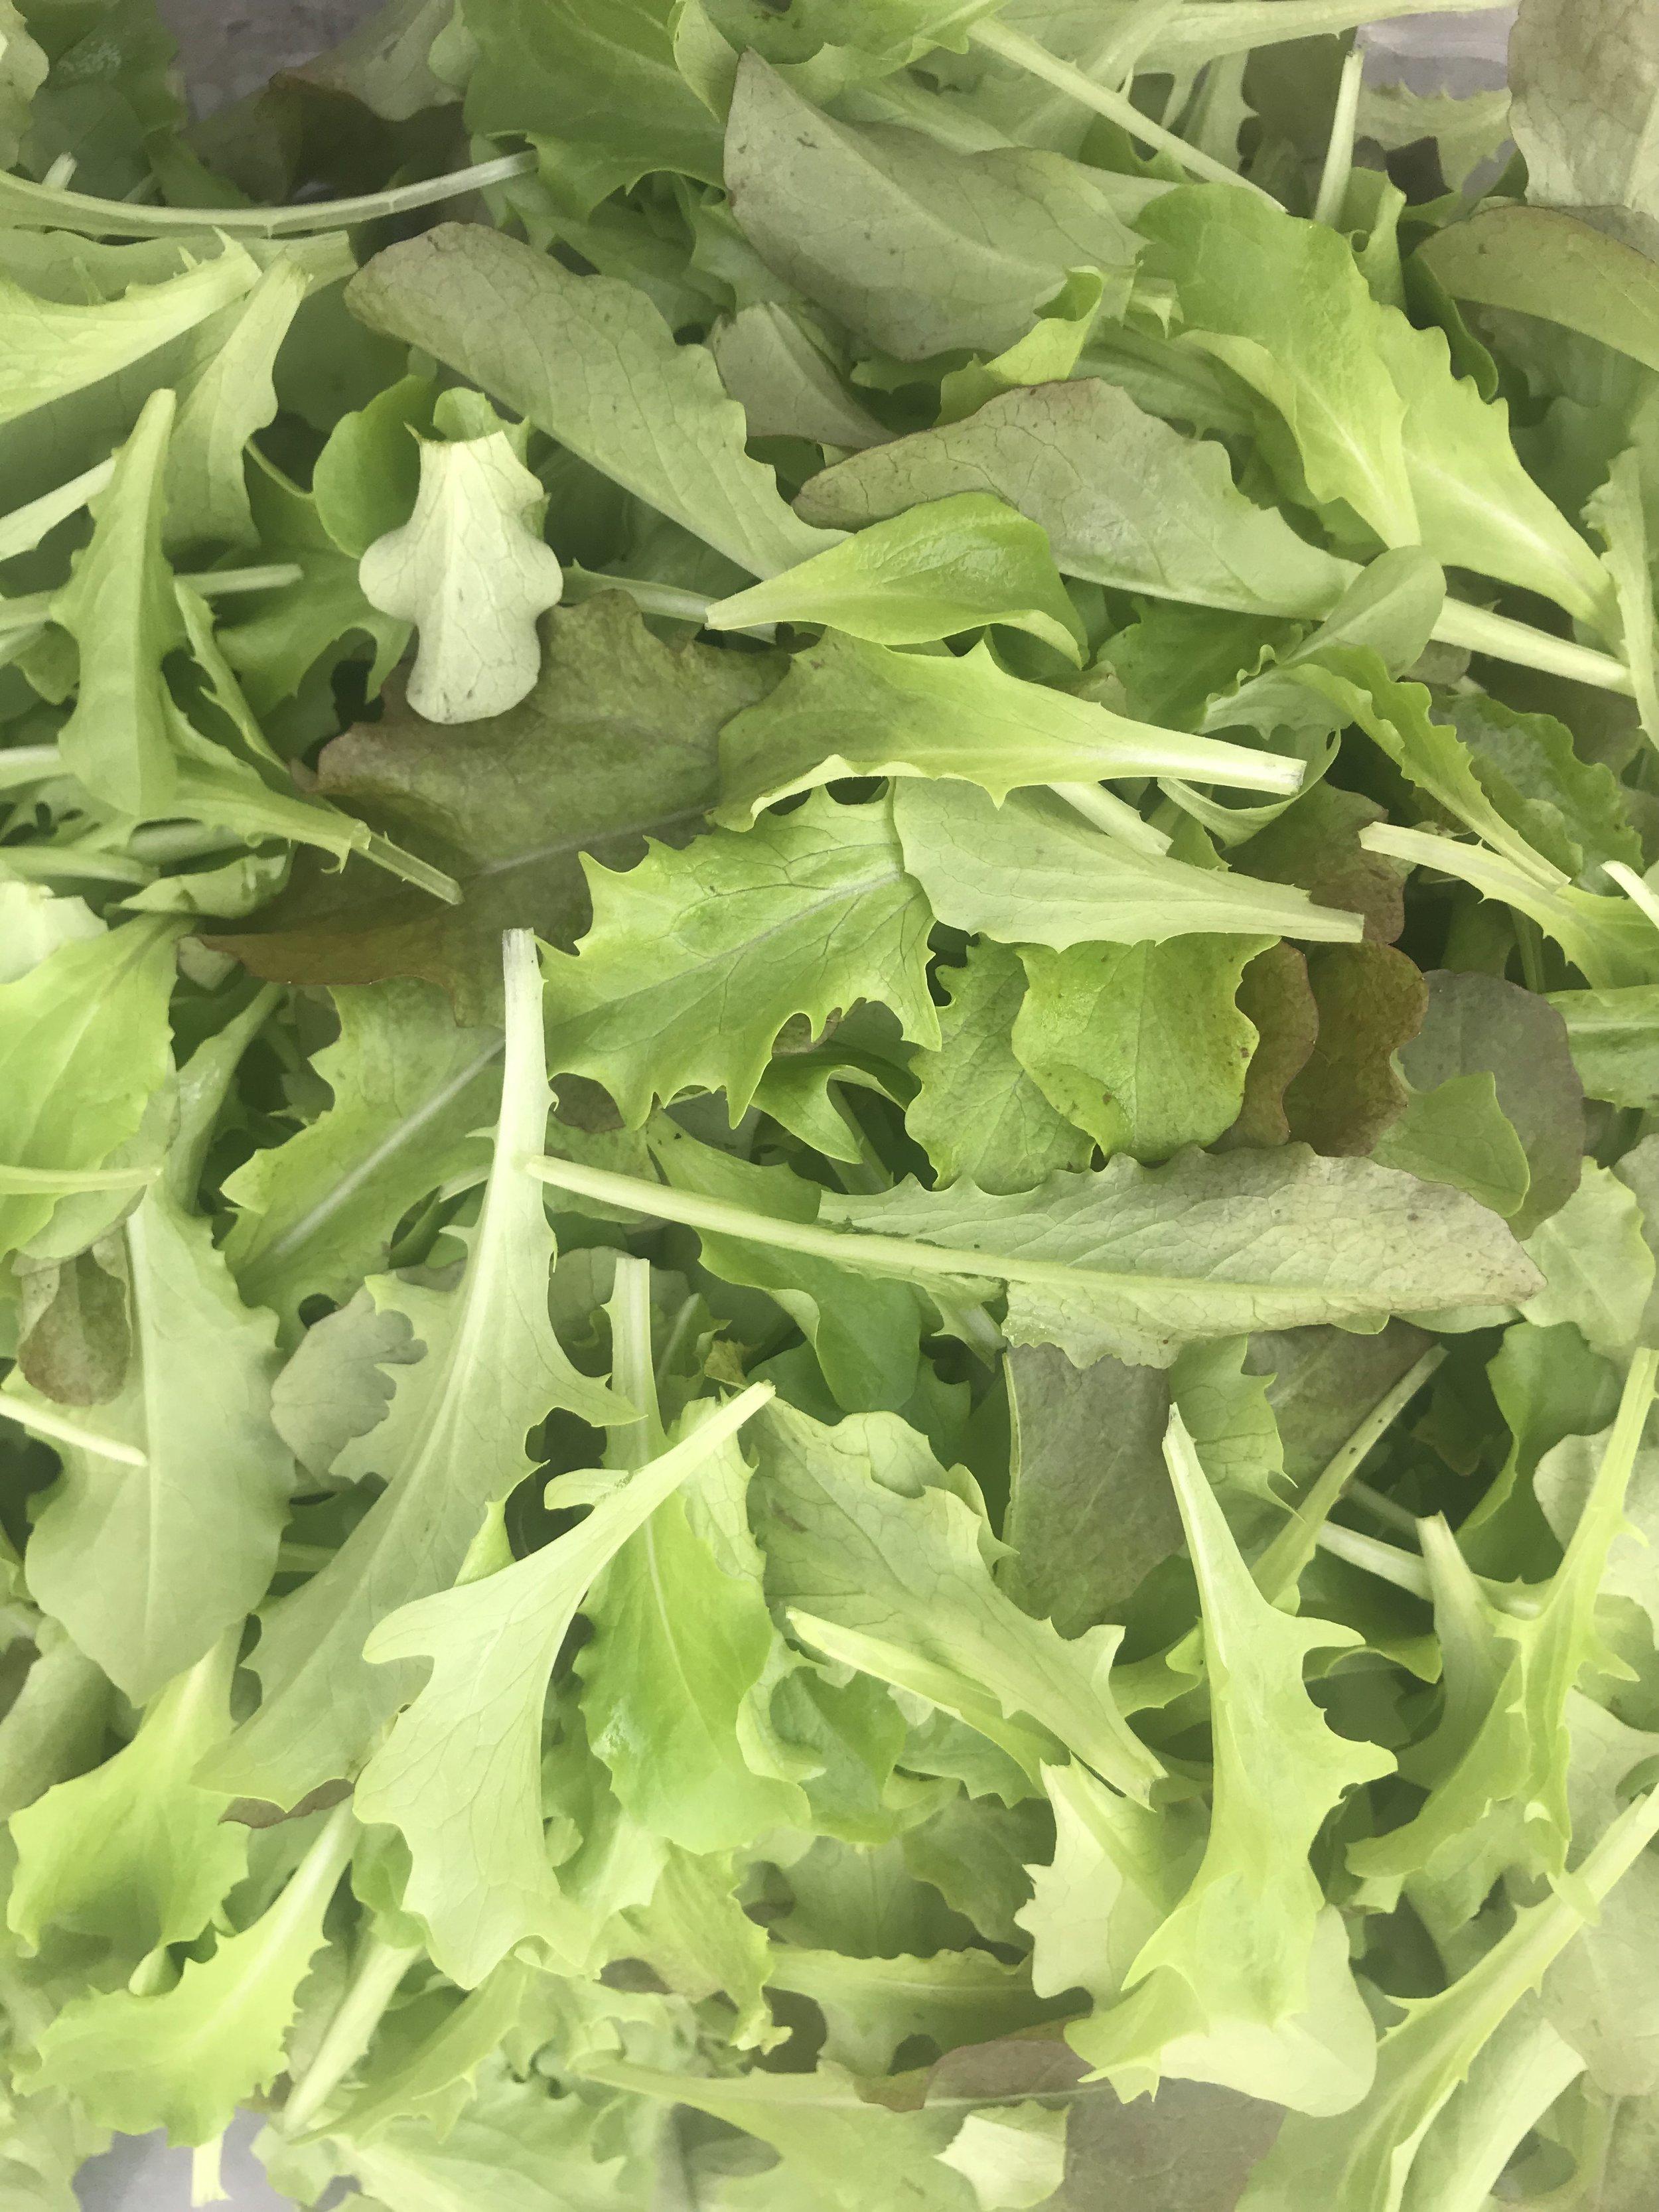 Gorgeous, tender salad greens